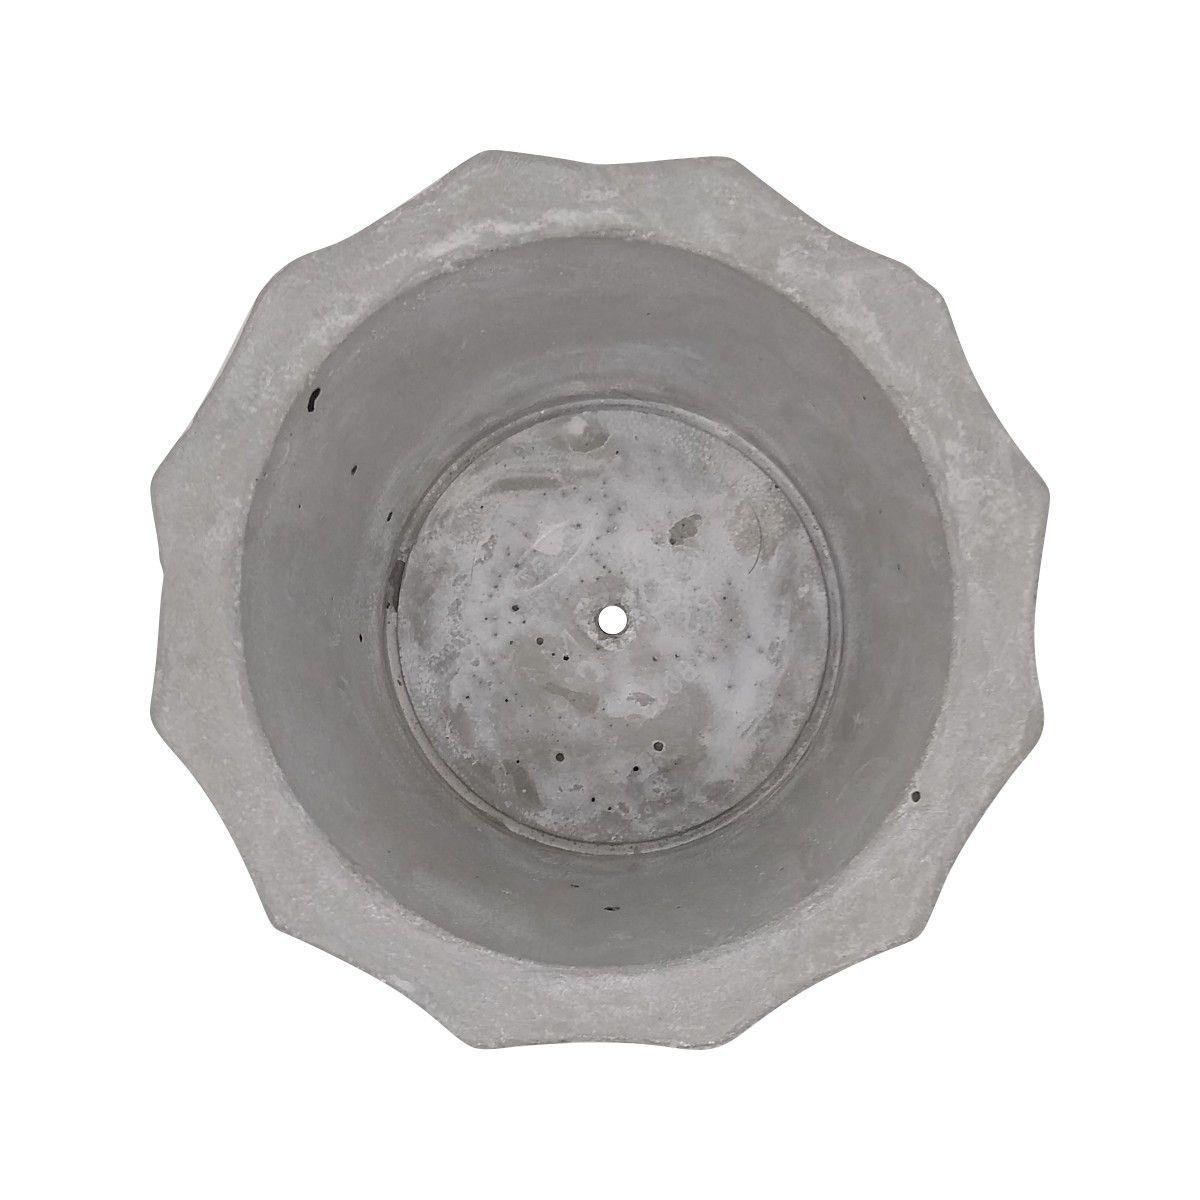 Vaso de Cimento 4,5 cm x 8,5 cm MD30